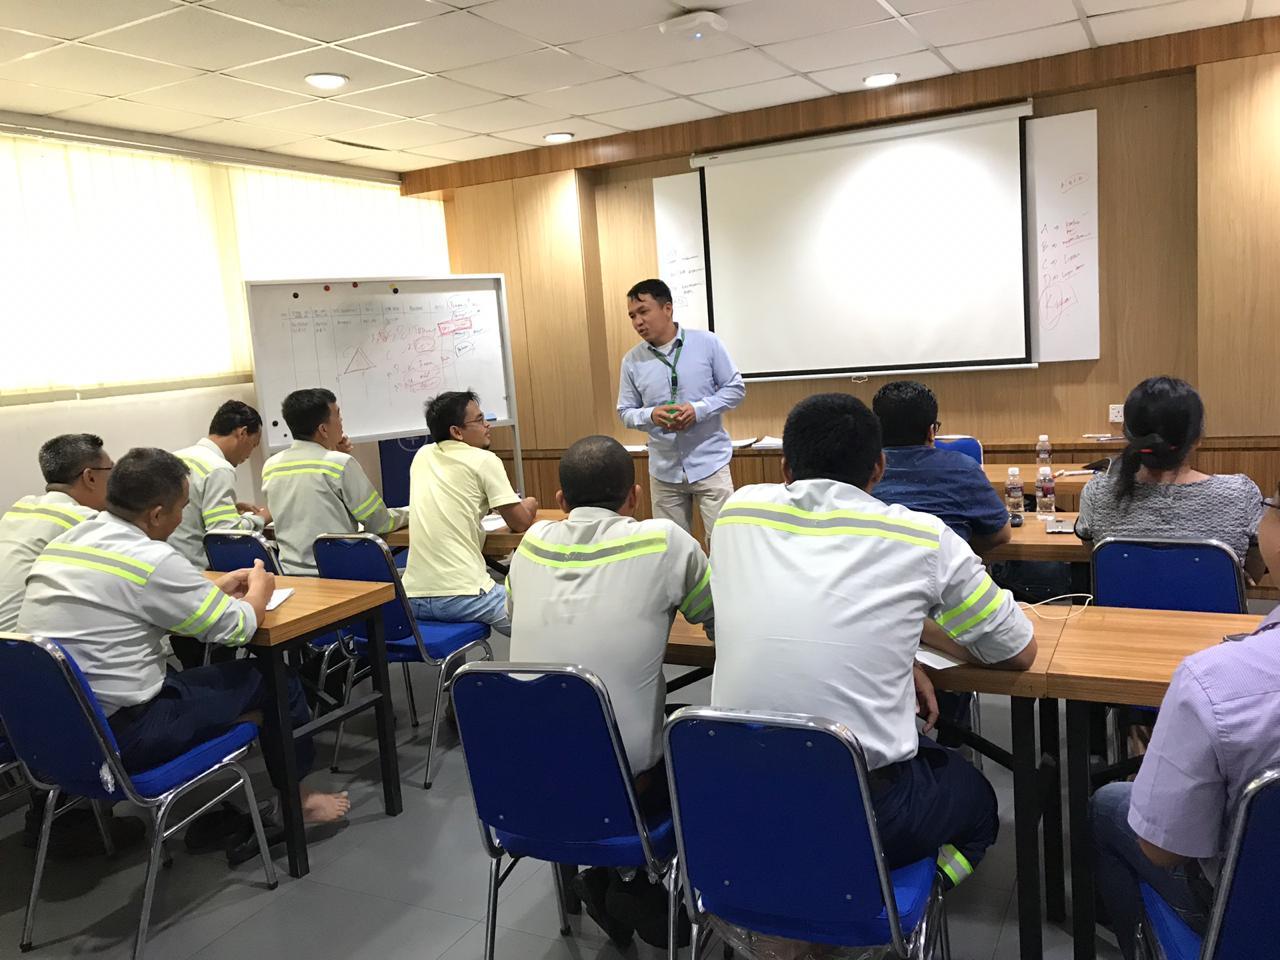 Inhouse Training batam, Kursus bahasa Inggris di batam, kursus bahasa inggris batam, les bahasa inggris batam, les bahasa inggris di batam, tempat les bahasa inggris batam, tempat les bahasa inggris di batam